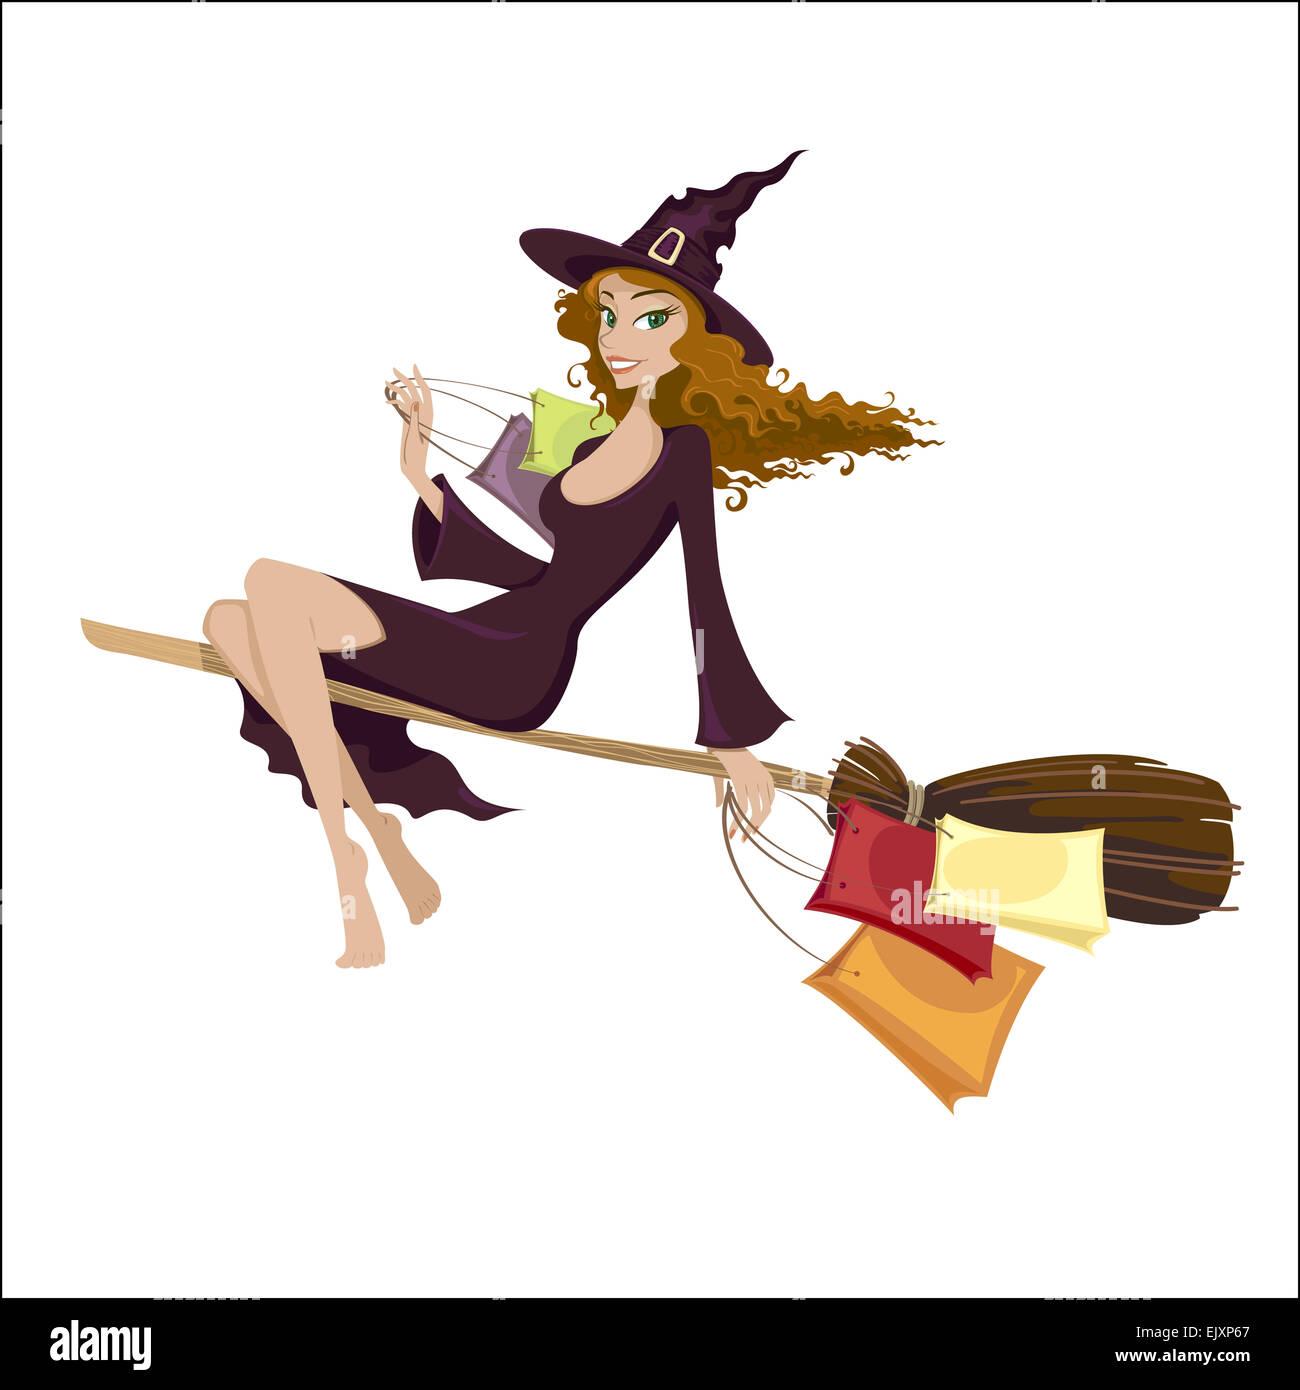 halloween hexe auf dem besen fliegen stockfoto bild 80493455 alamy. Black Bedroom Furniture Sets. Home Design Ideas